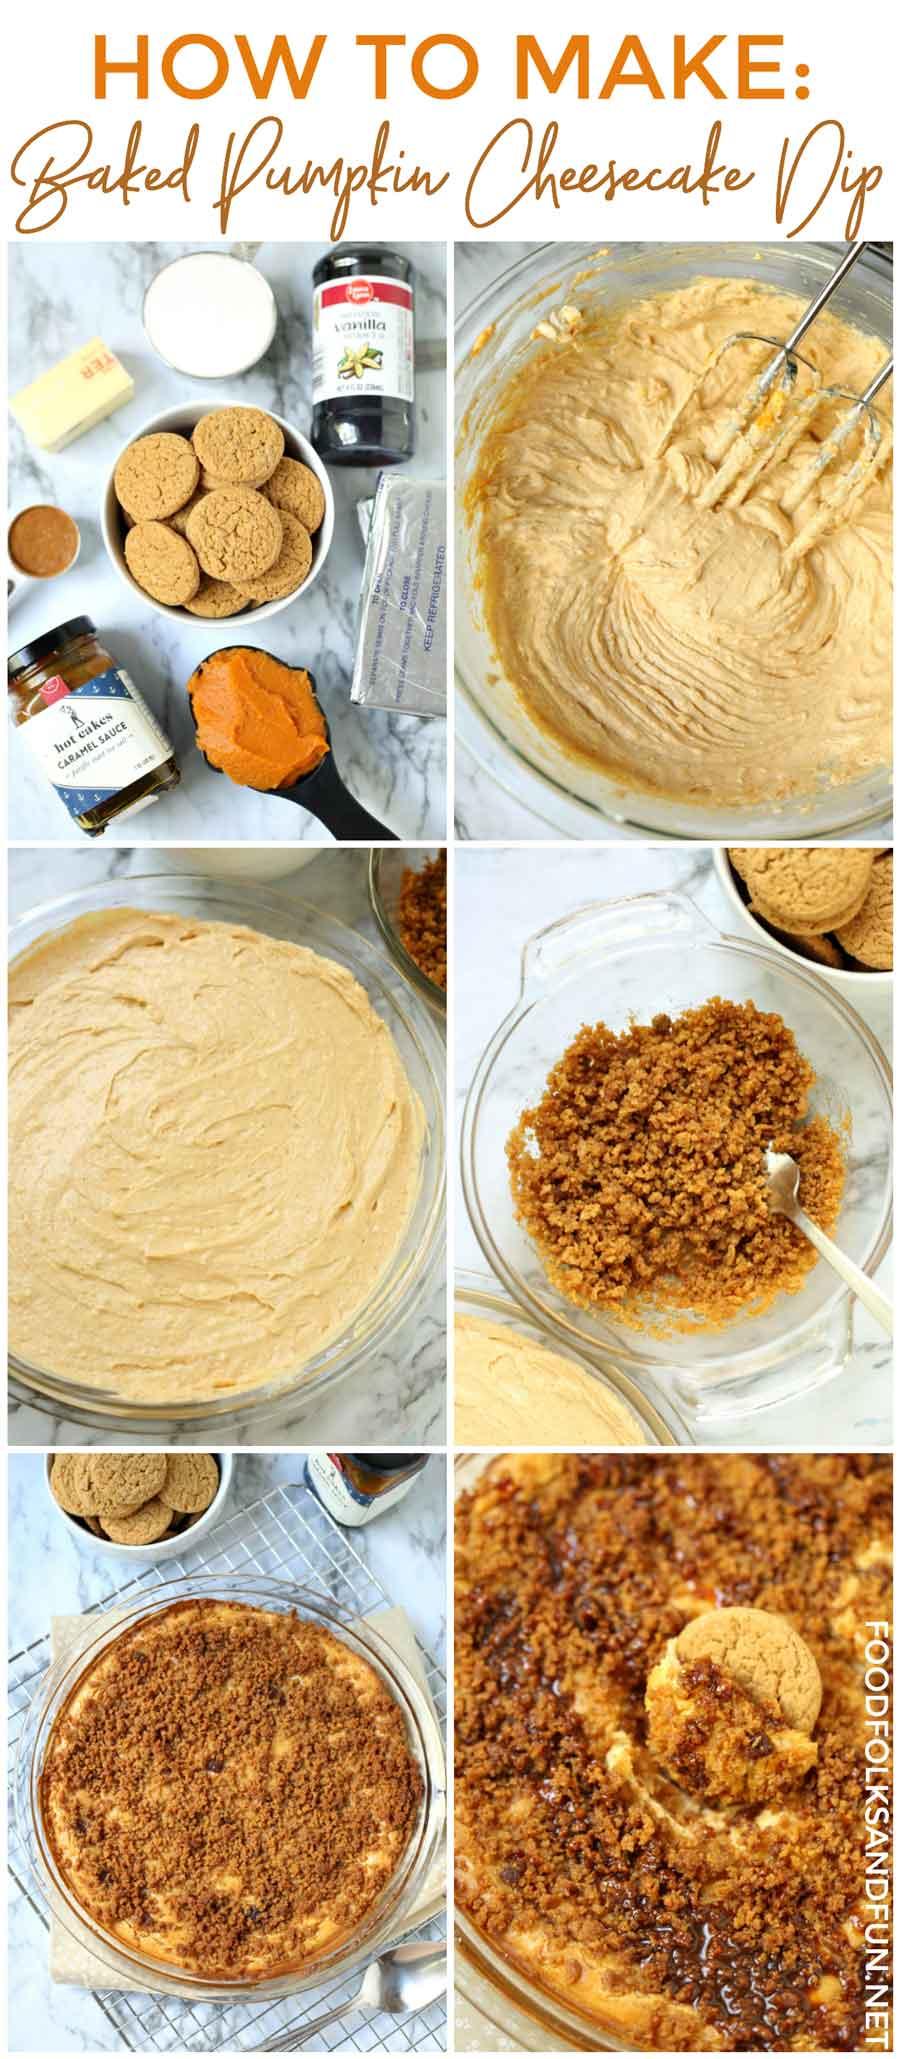 Hot to make this super easy pumpkin cheesecake dip.